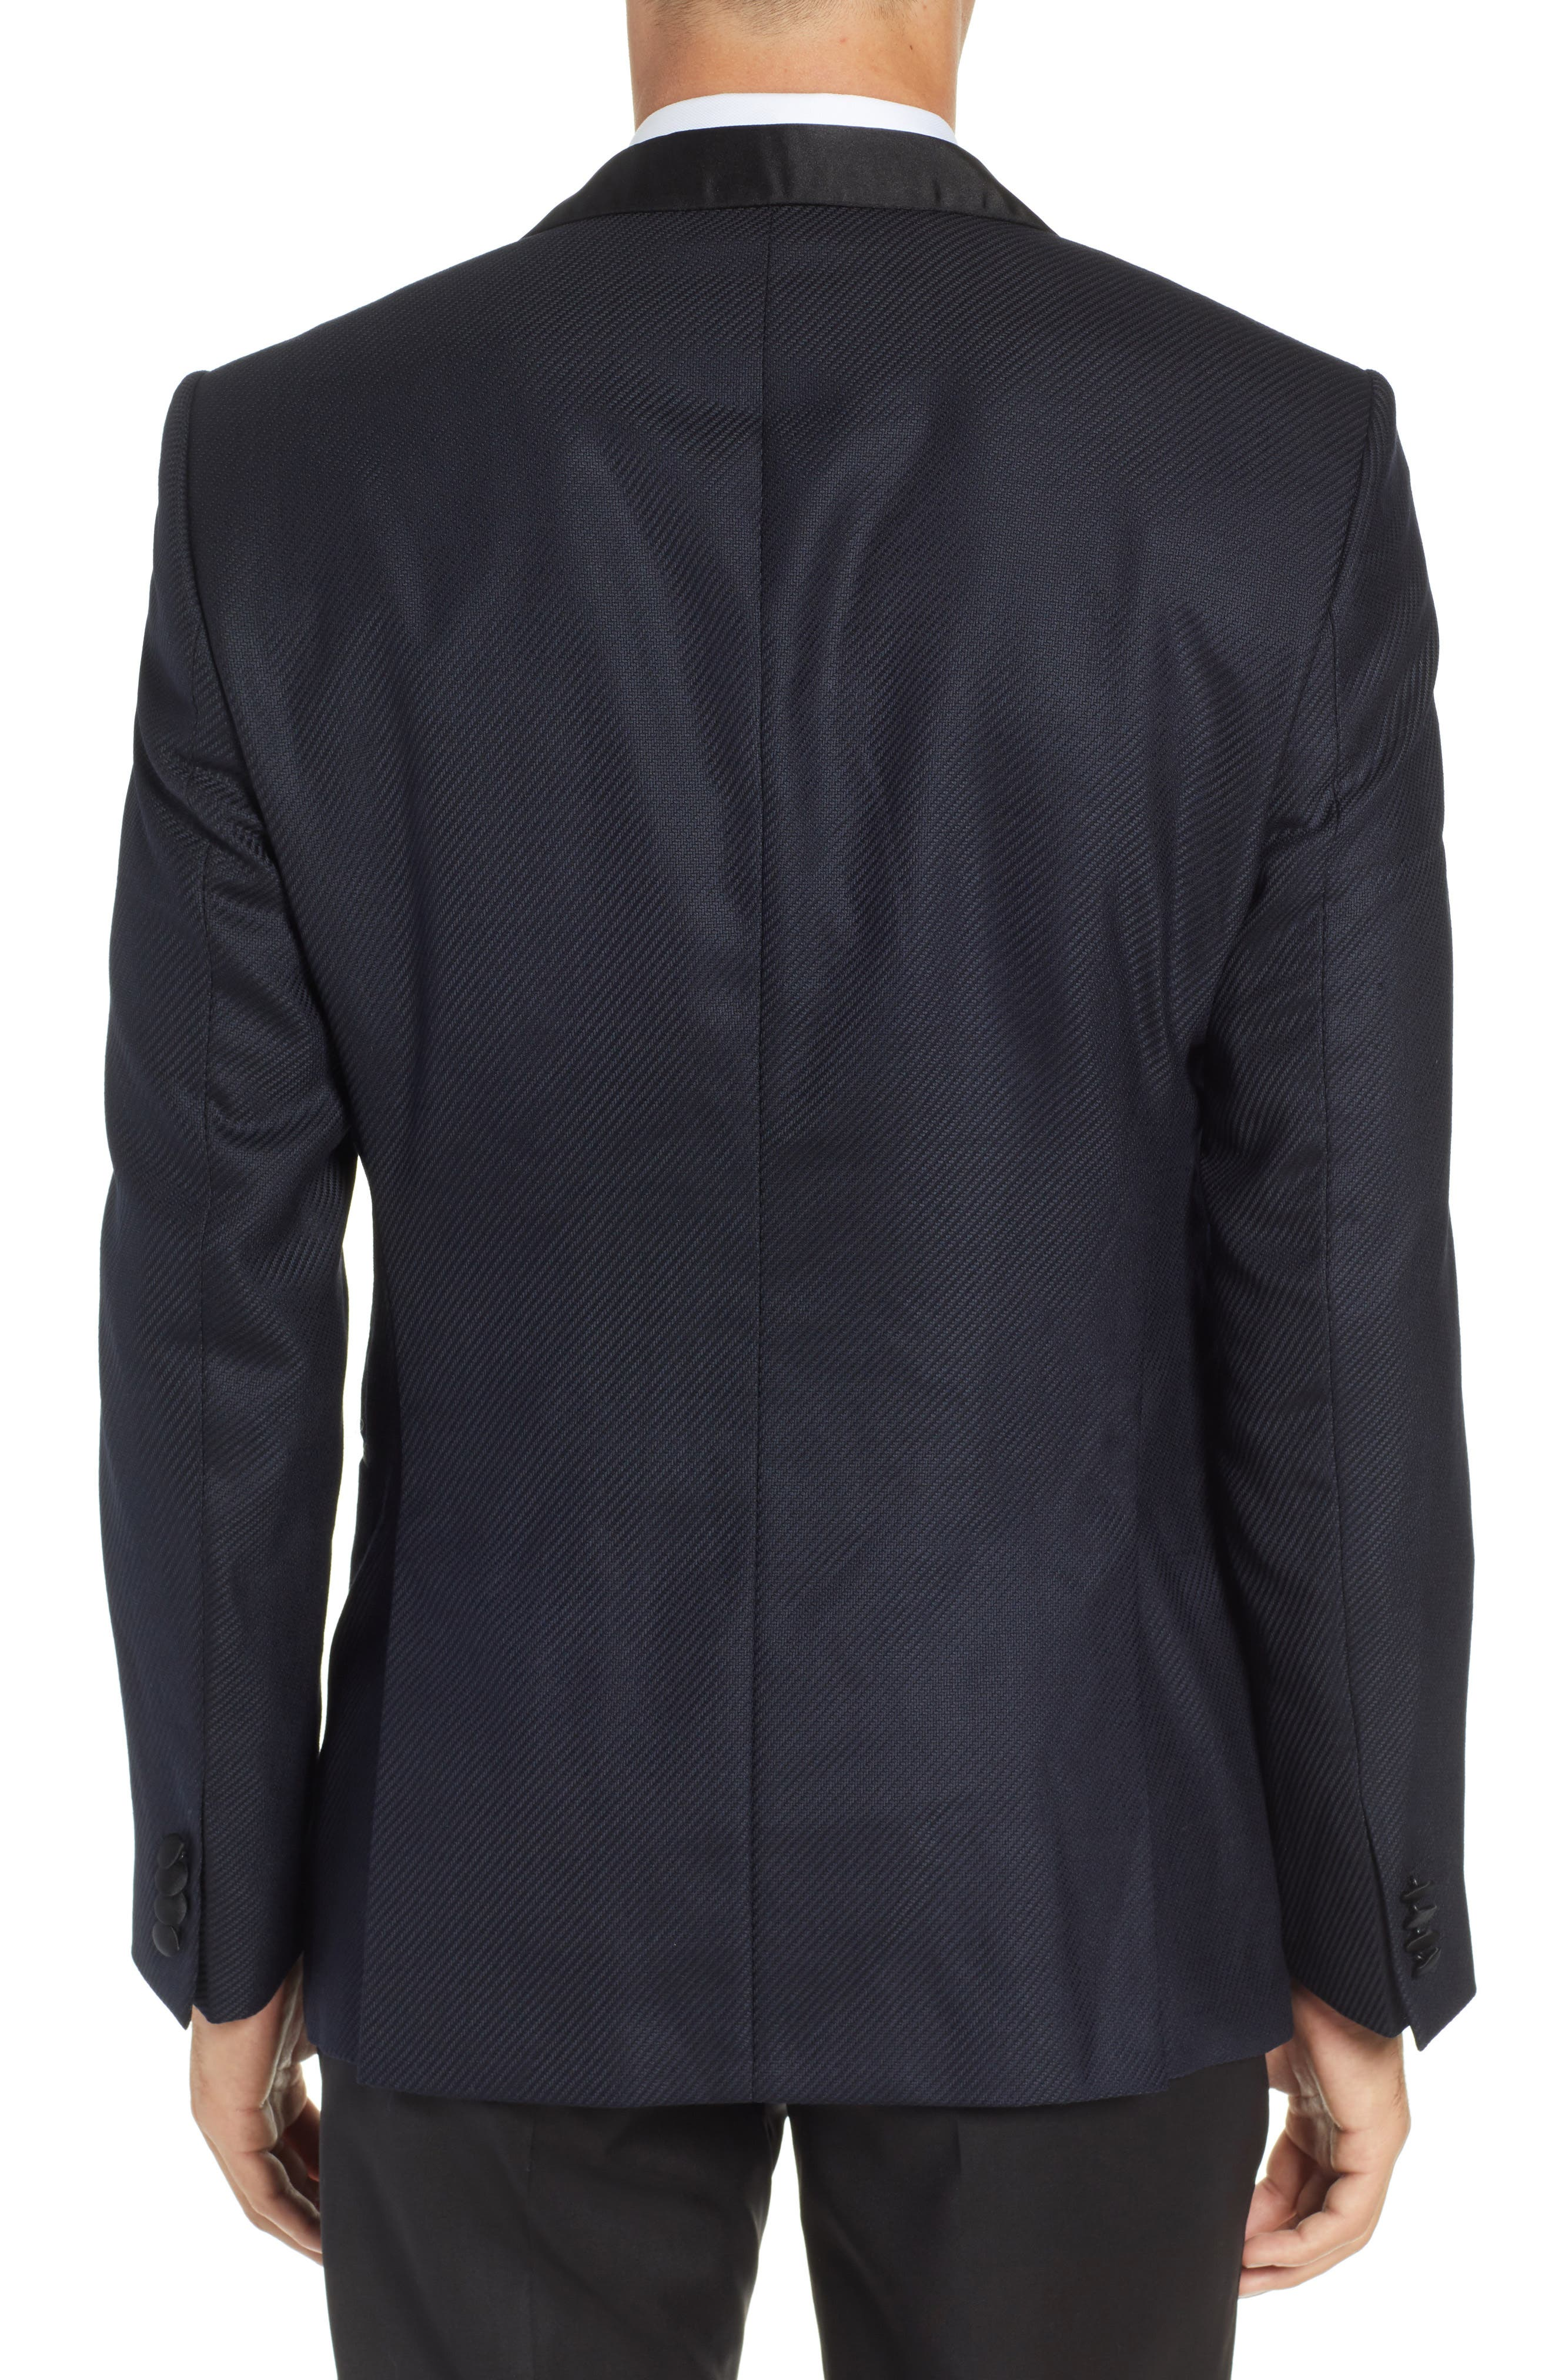 Hockley Slim Fit Wool Dinner Jacket,                             Alternate thumbnail 2, color,                             OPEN BLUE